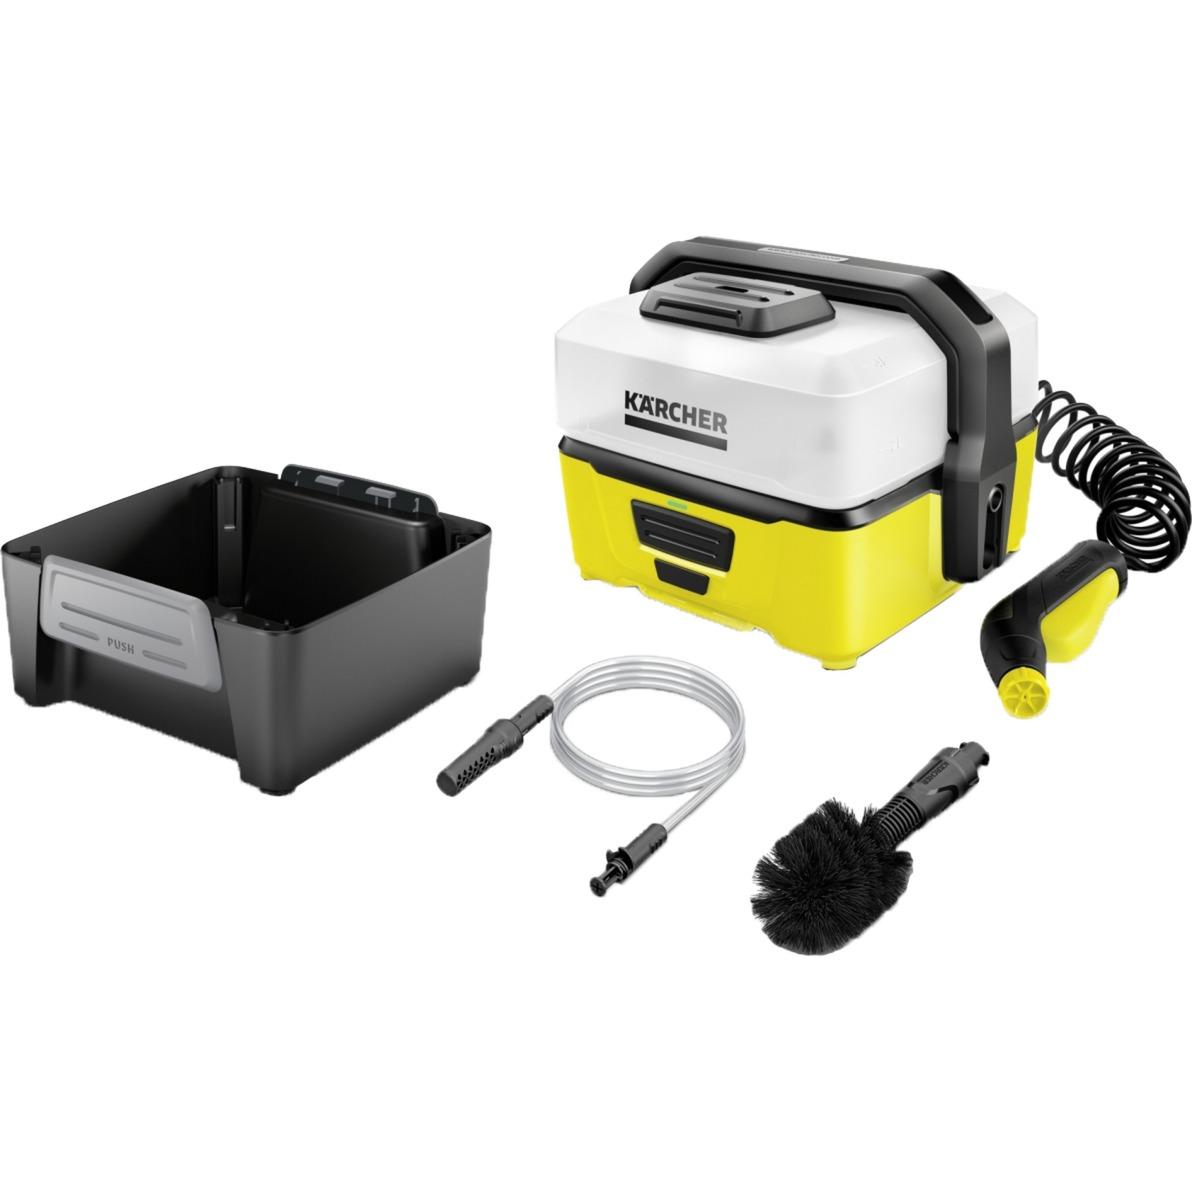 1680-0020-low-pressure-cleaner